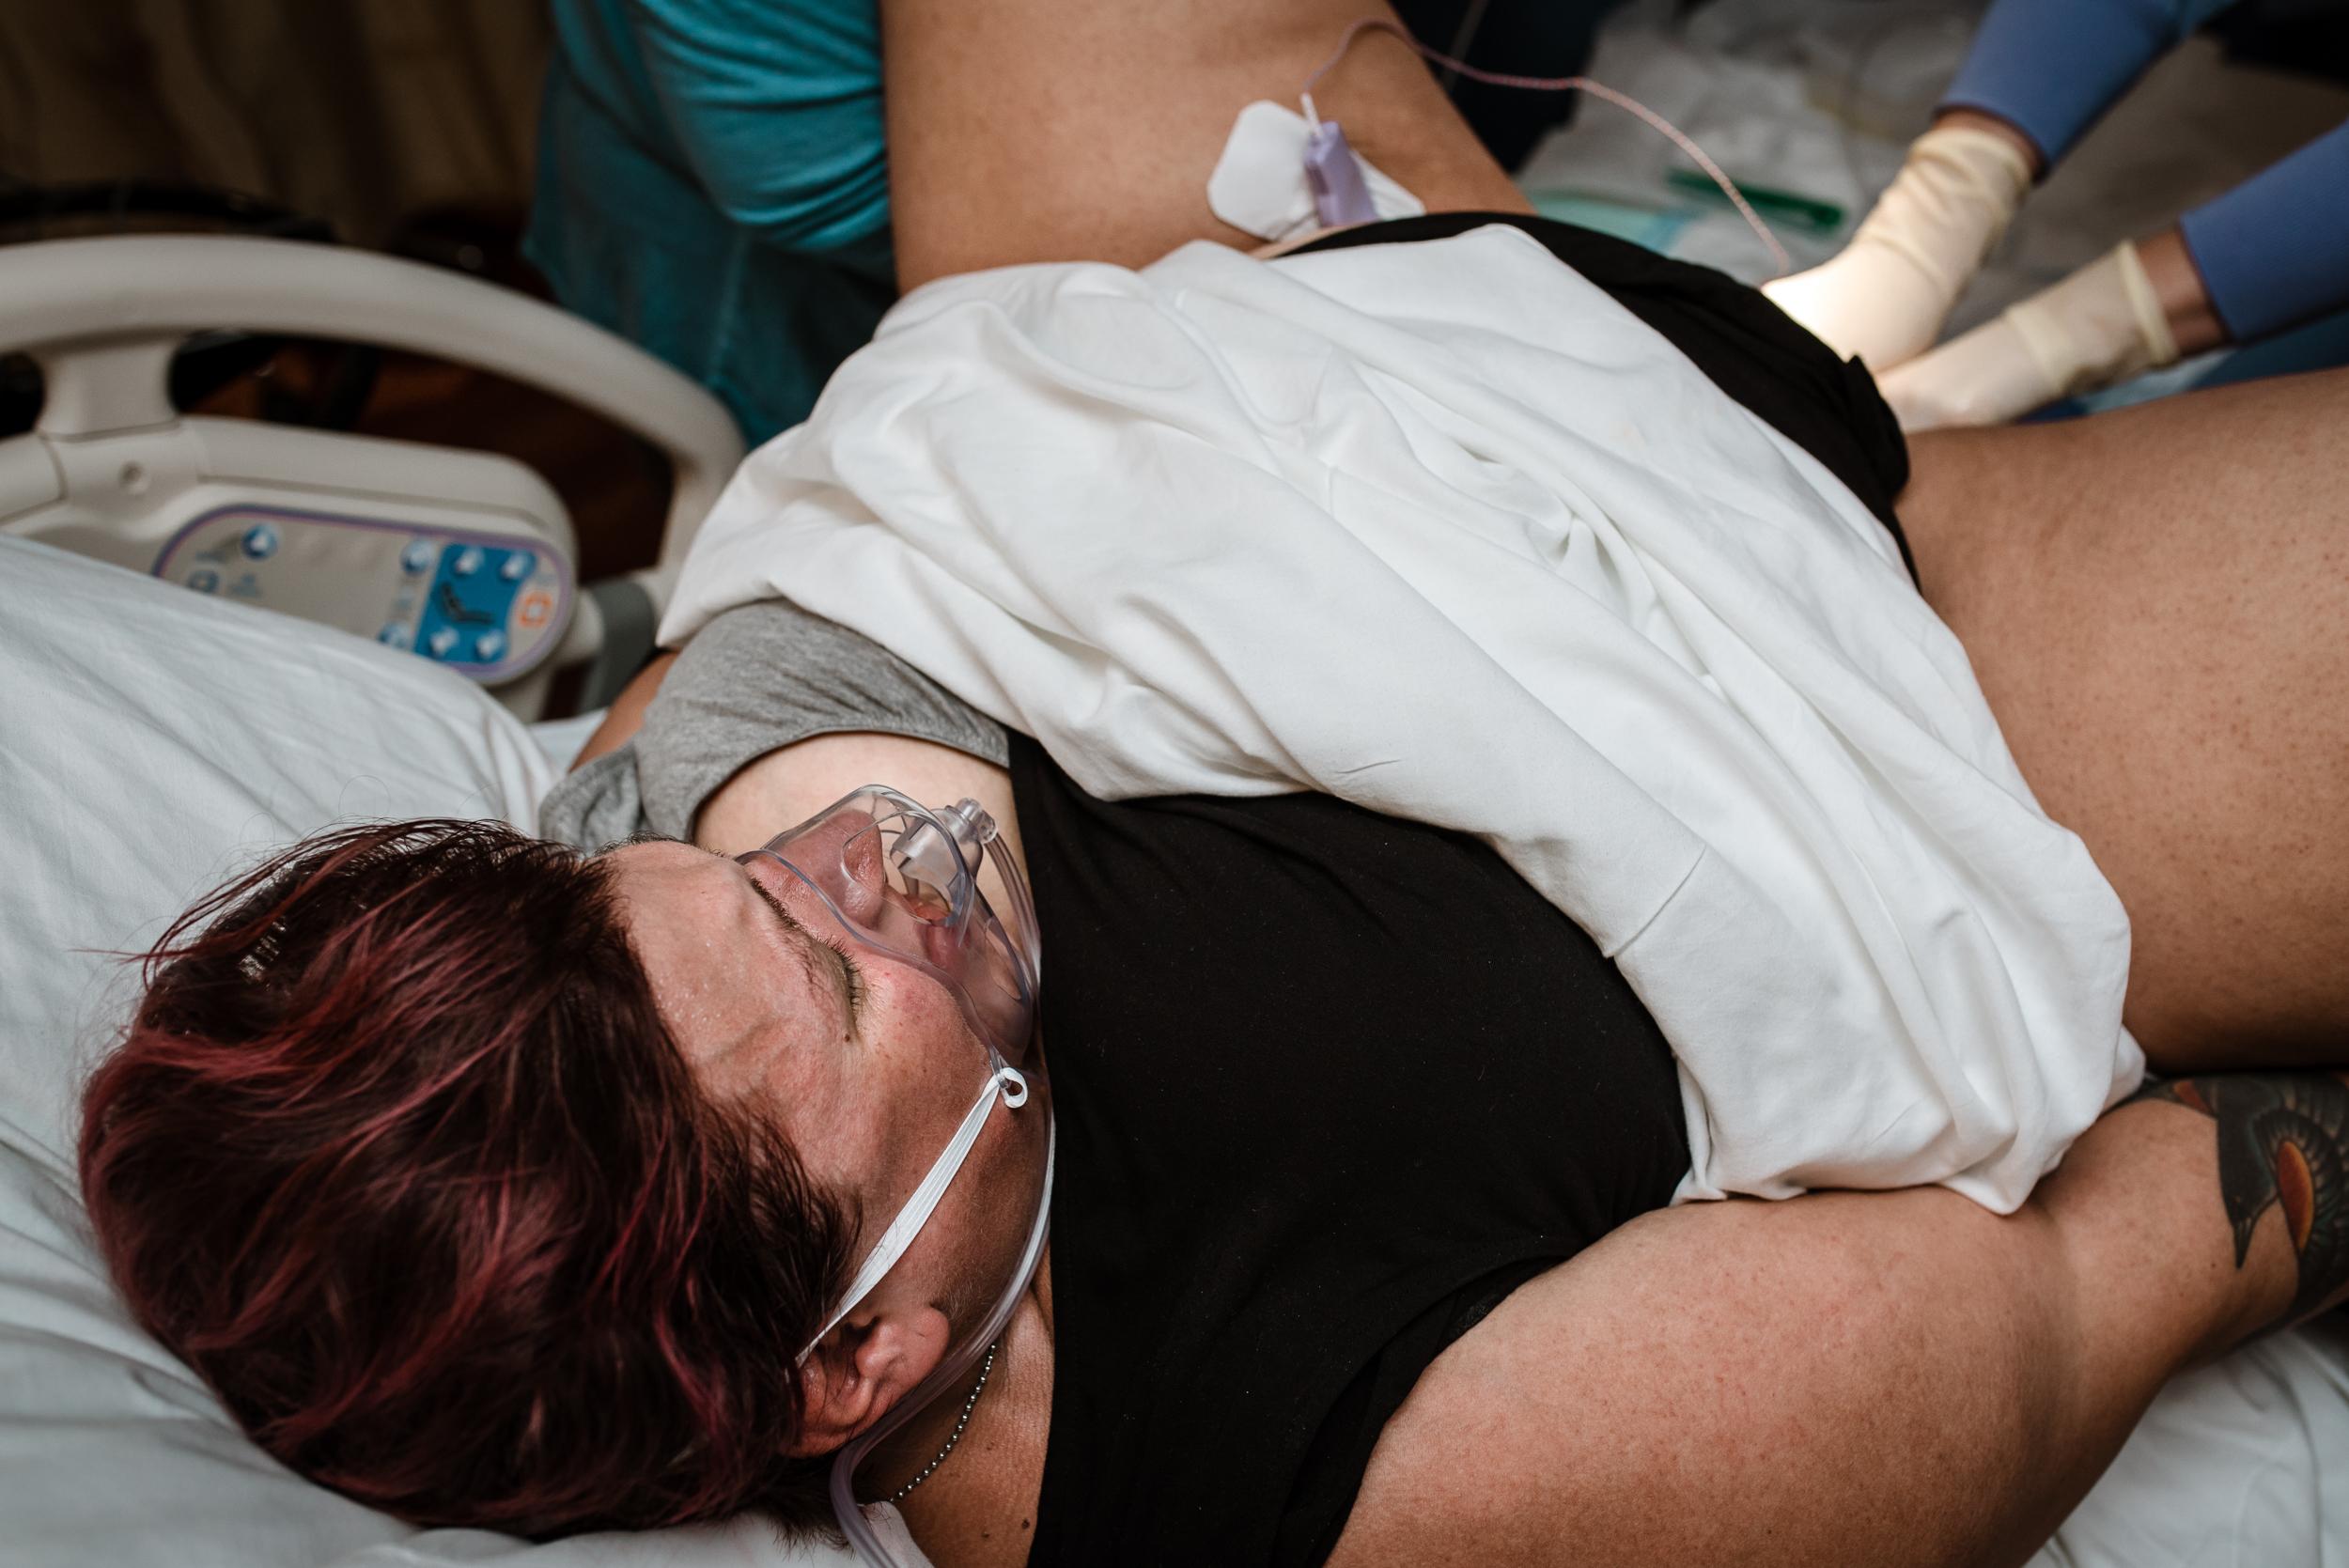 Meredith Westin Photography- Minneapolis Birth Stories and Films-November 08, 2018-154104.jpg